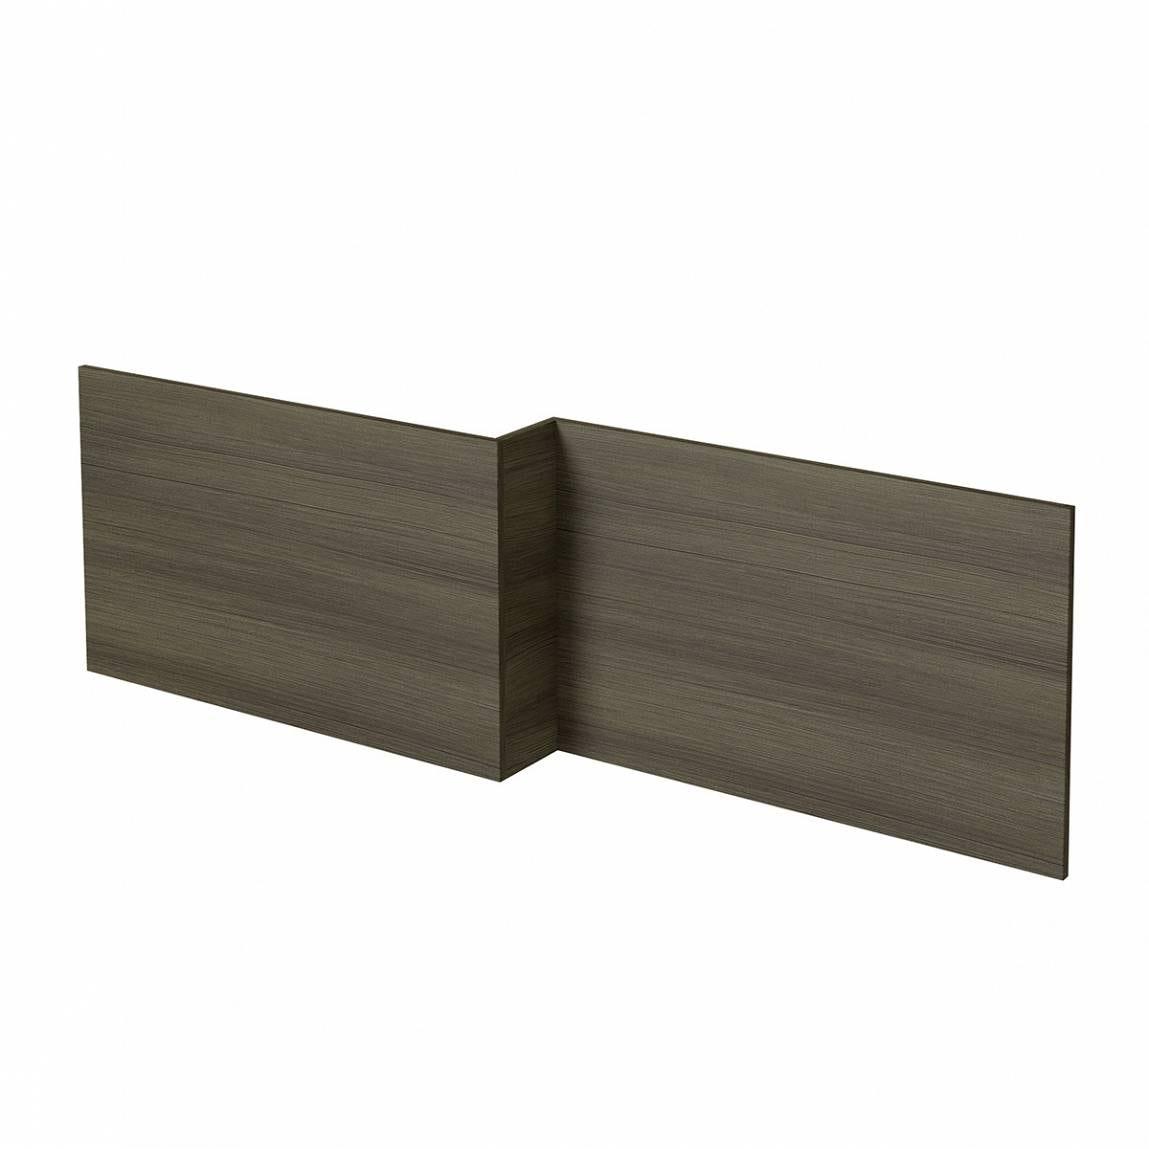 l shaped shower bath wooden front panel drift walnut premier 1500mm l shaped shower bath with acrylic front